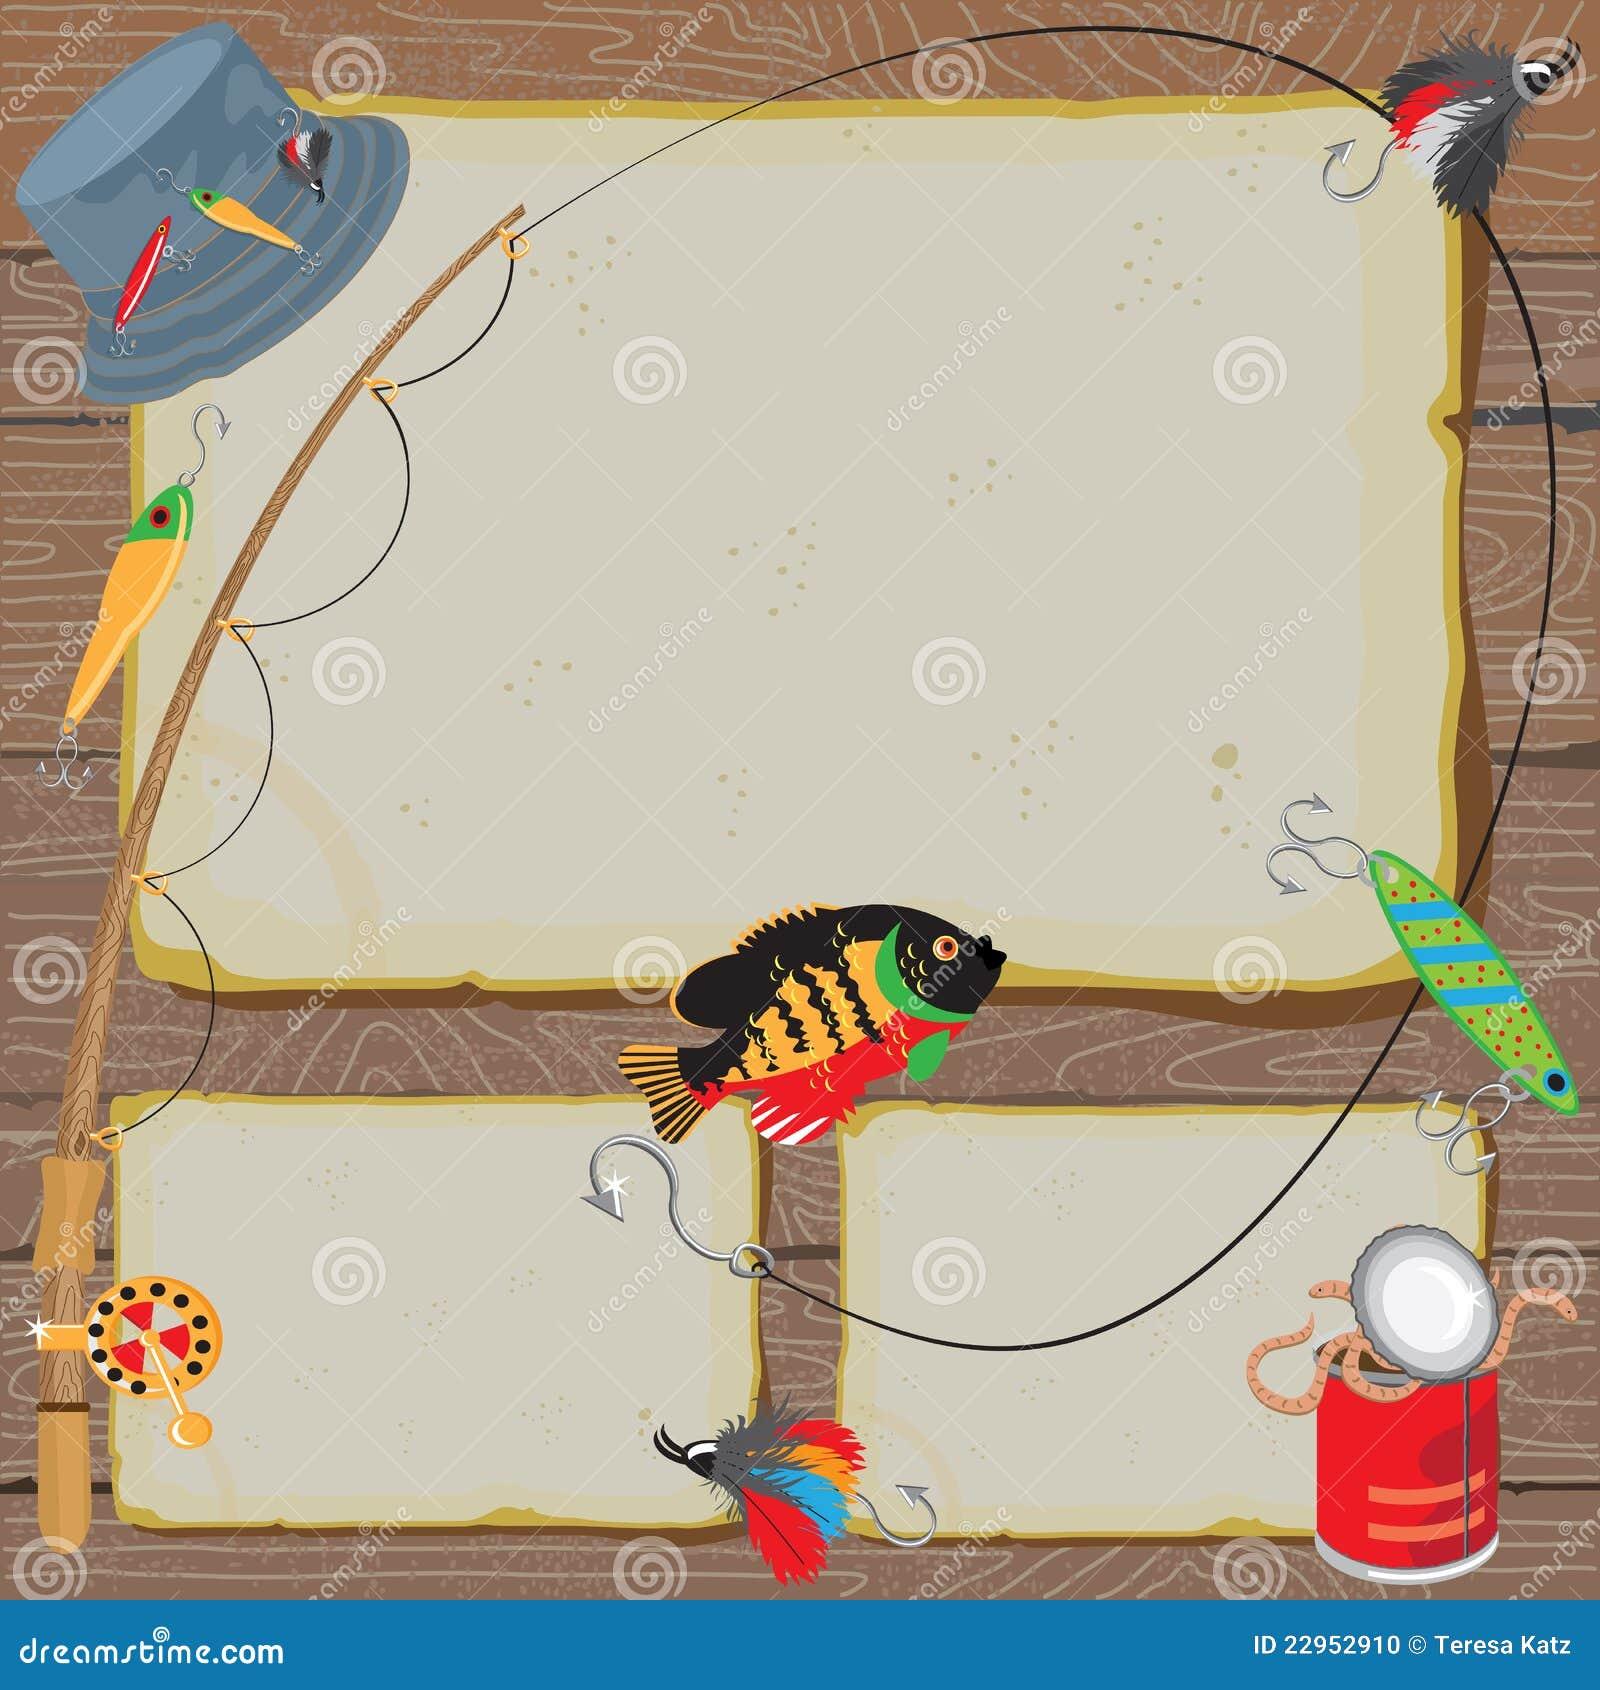 Fishing Invitation Notice Card Stock Photo Image 22952910